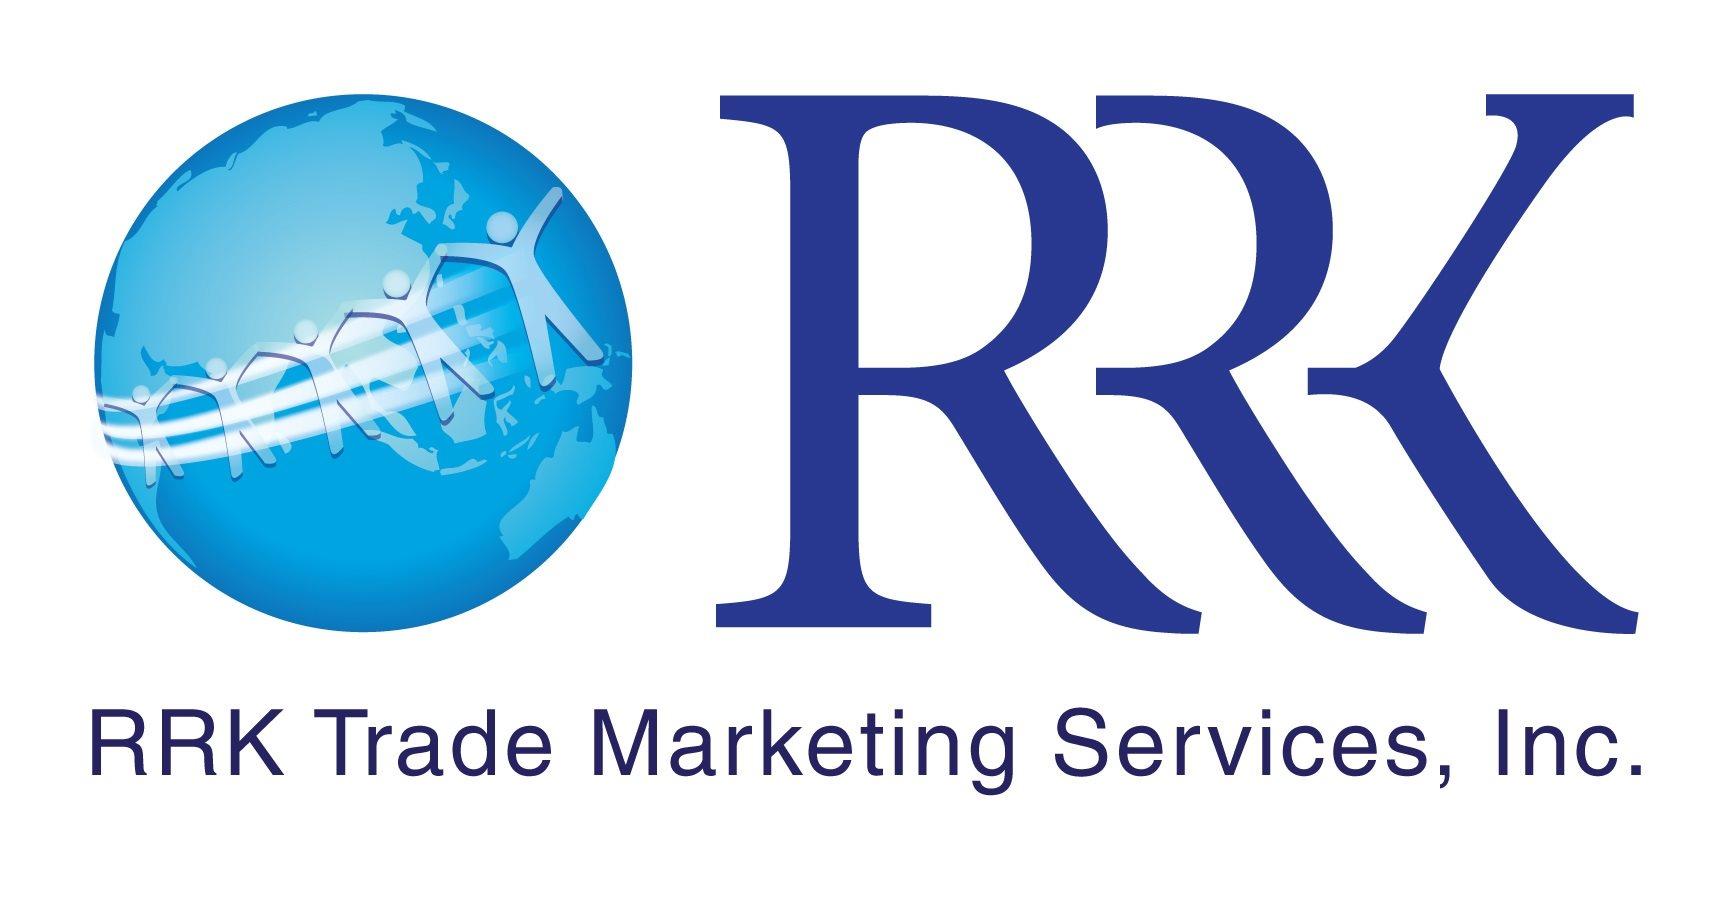 RRK Trade Marketing Services, Inc.